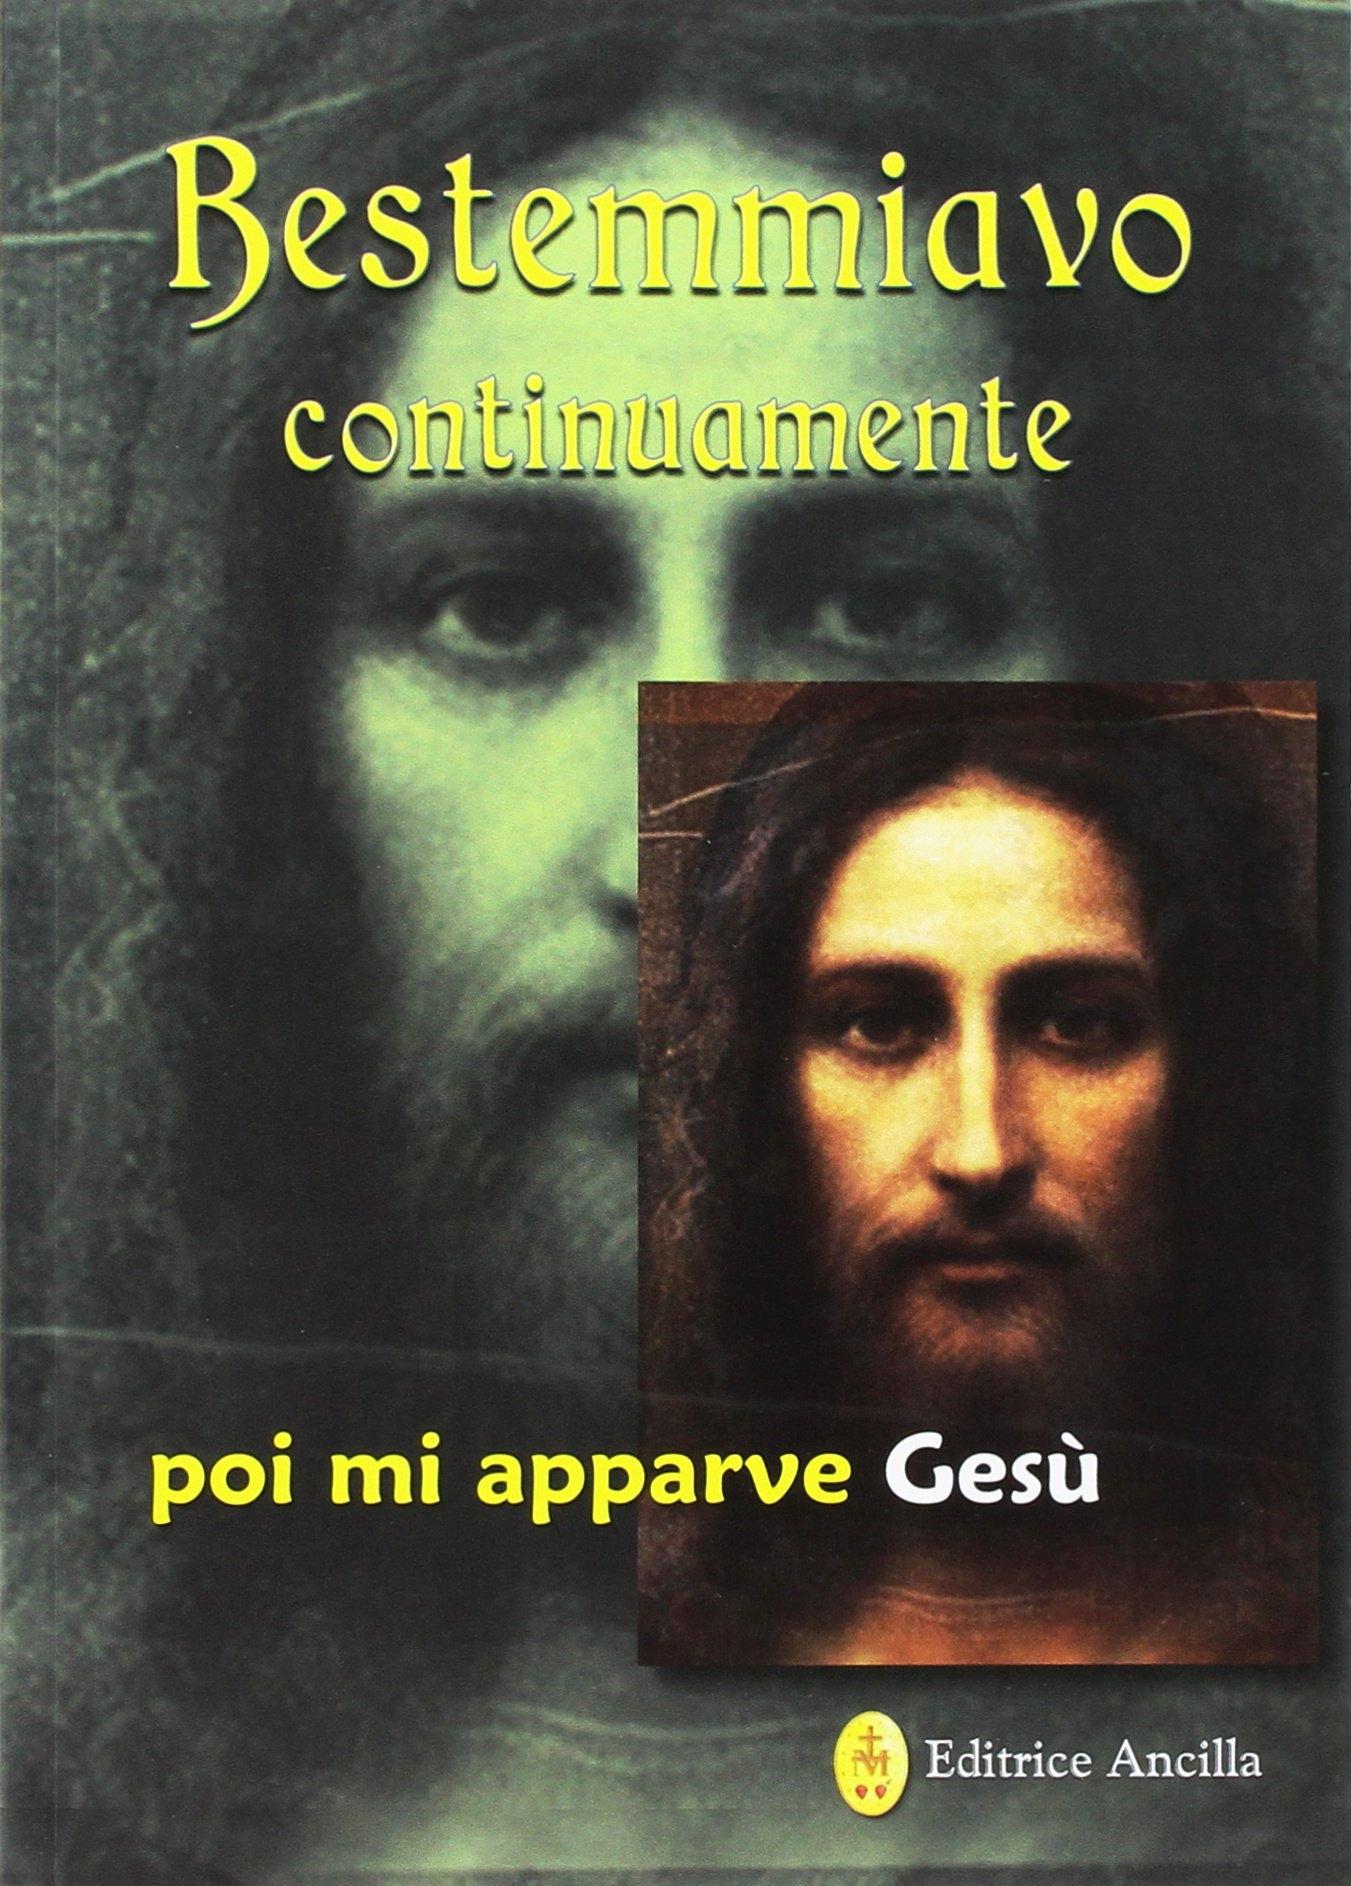 Bestemmiavo continuamente... poi mi apparve Gesù